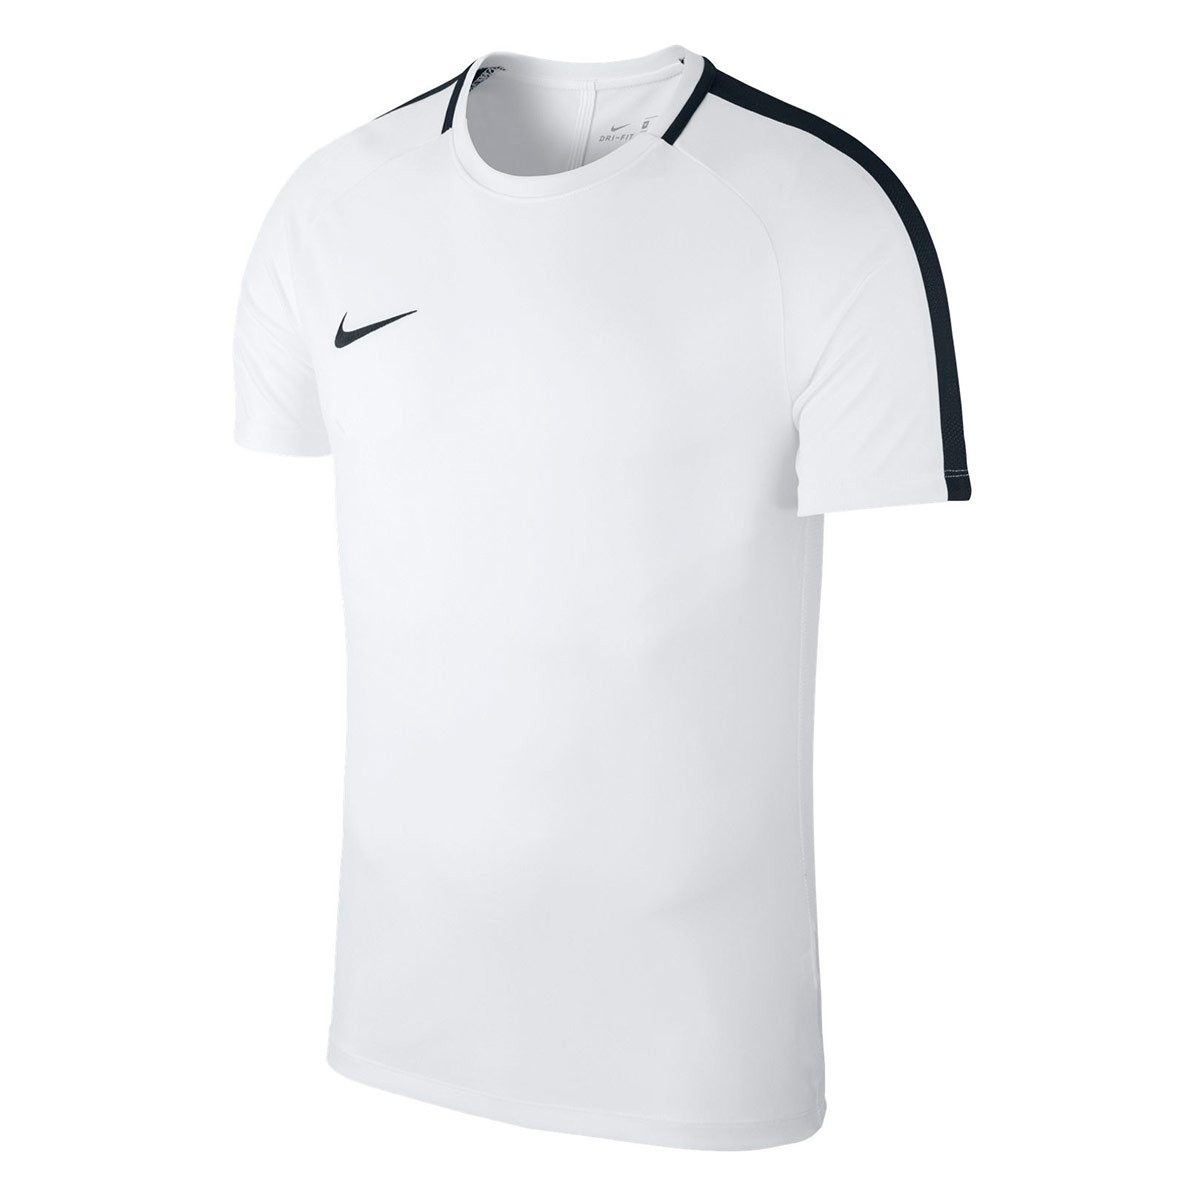 4e8d678eaf Jersey Nike Dry Academy 18 Niño White-Black - Leaked soccer